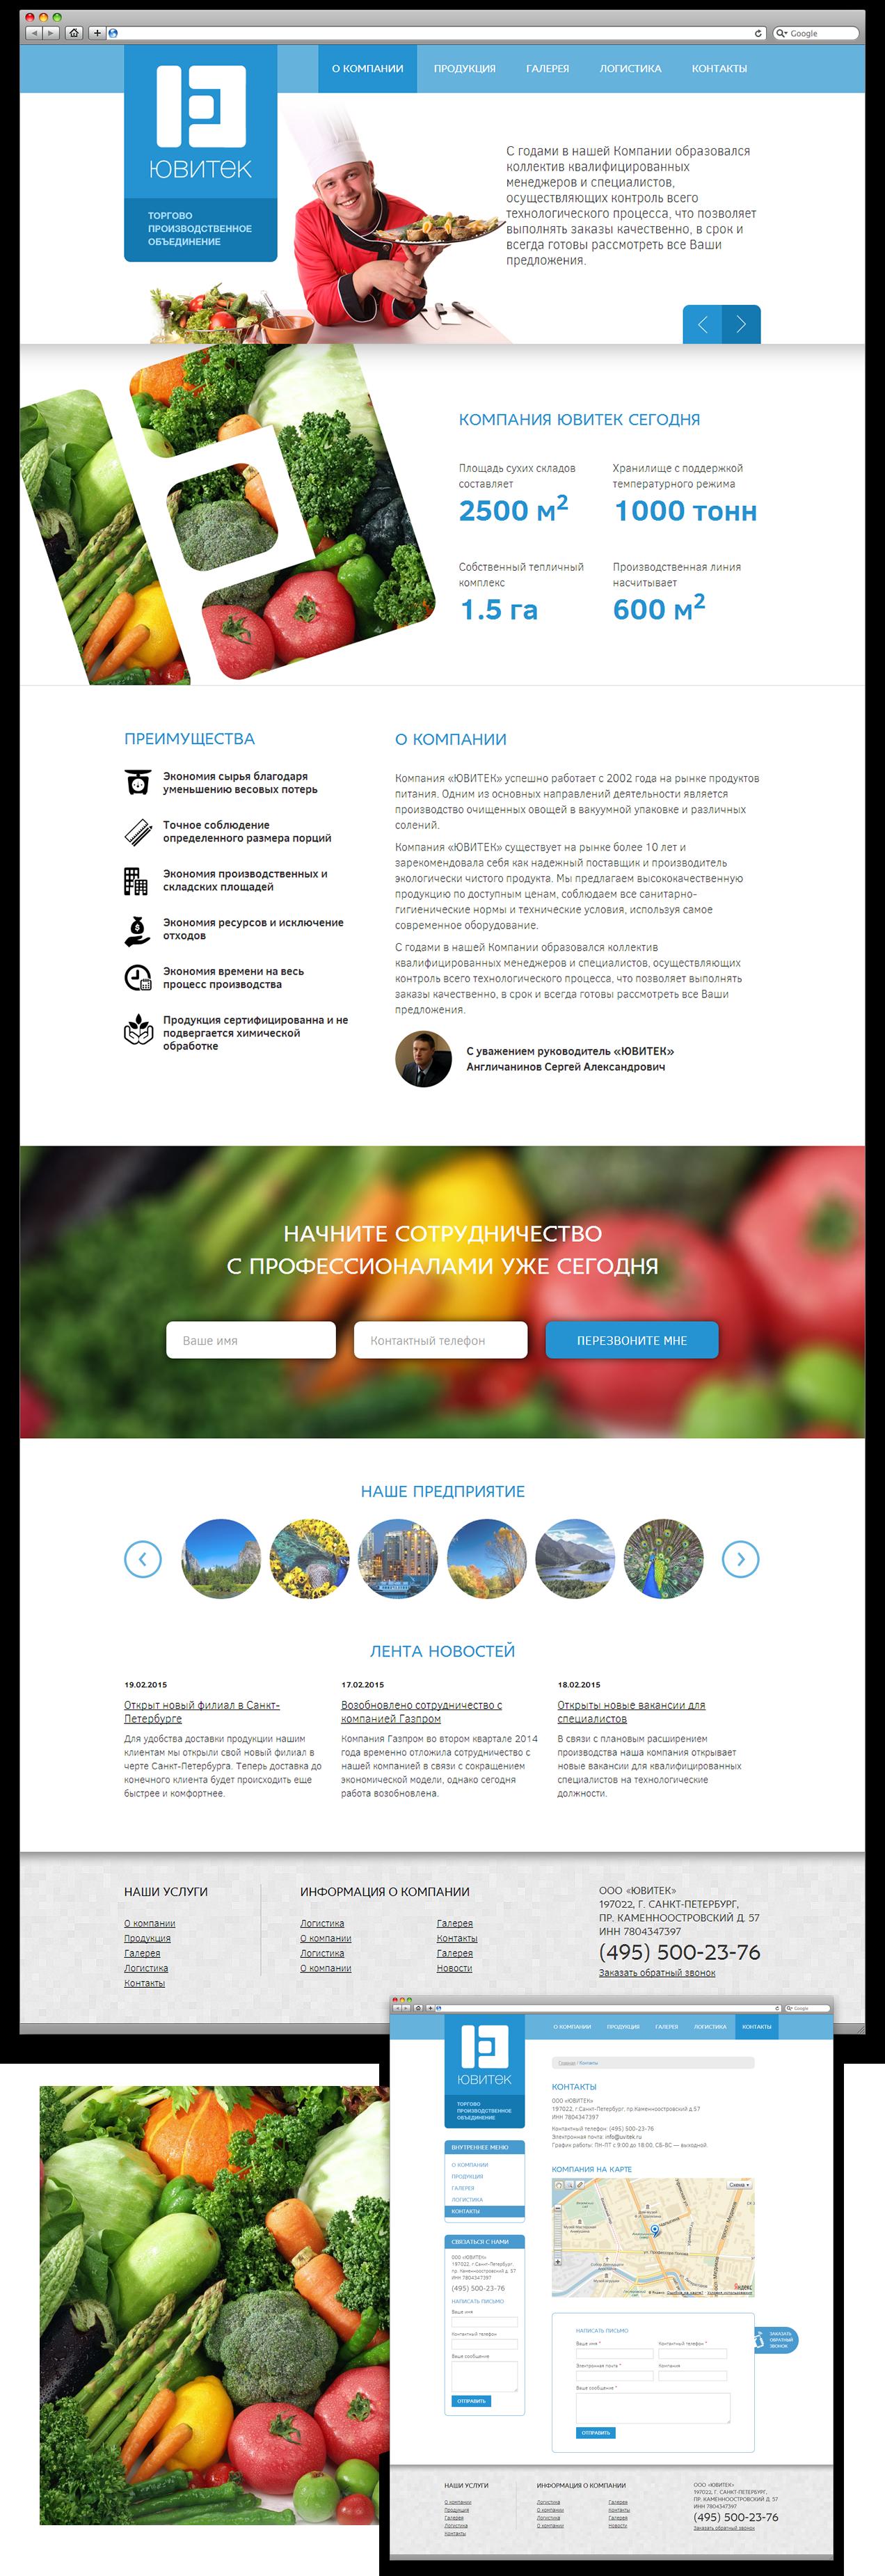 Сайт компании «Ювитек», г. Санкт-Петербург